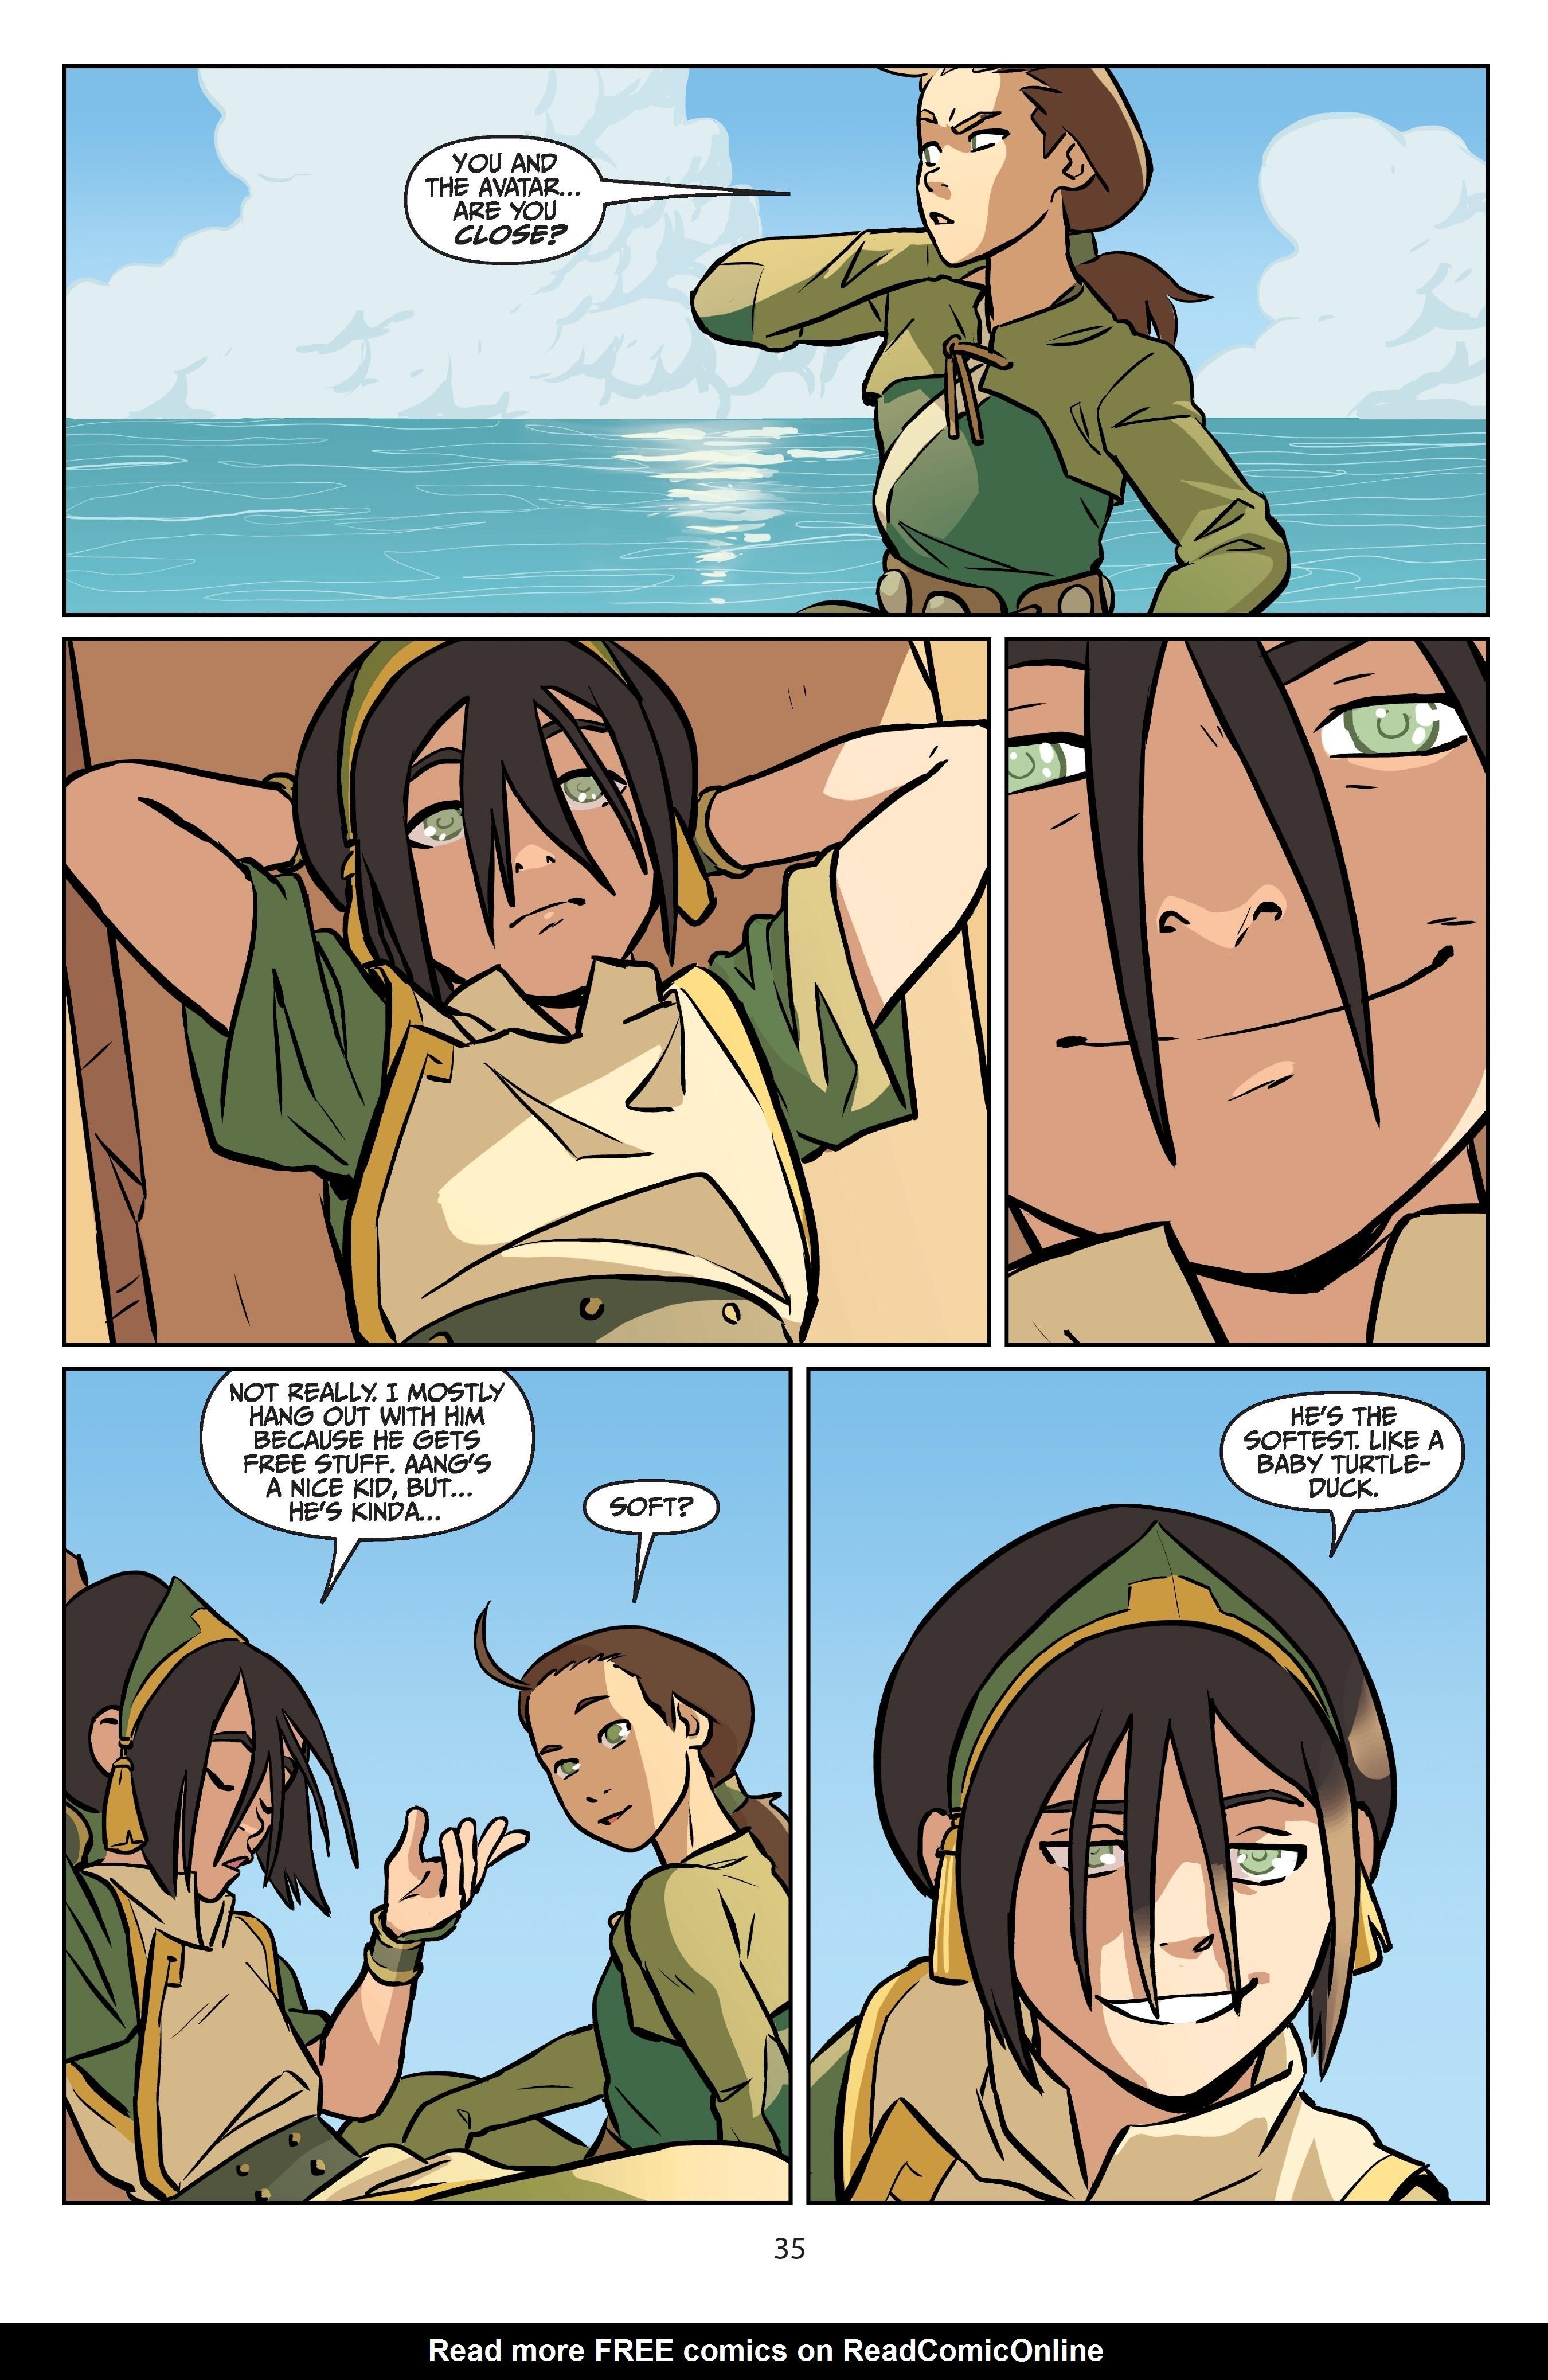 Nickelodeon Avatar: The Last Airbender - Imbalance TPB_2 Page 35